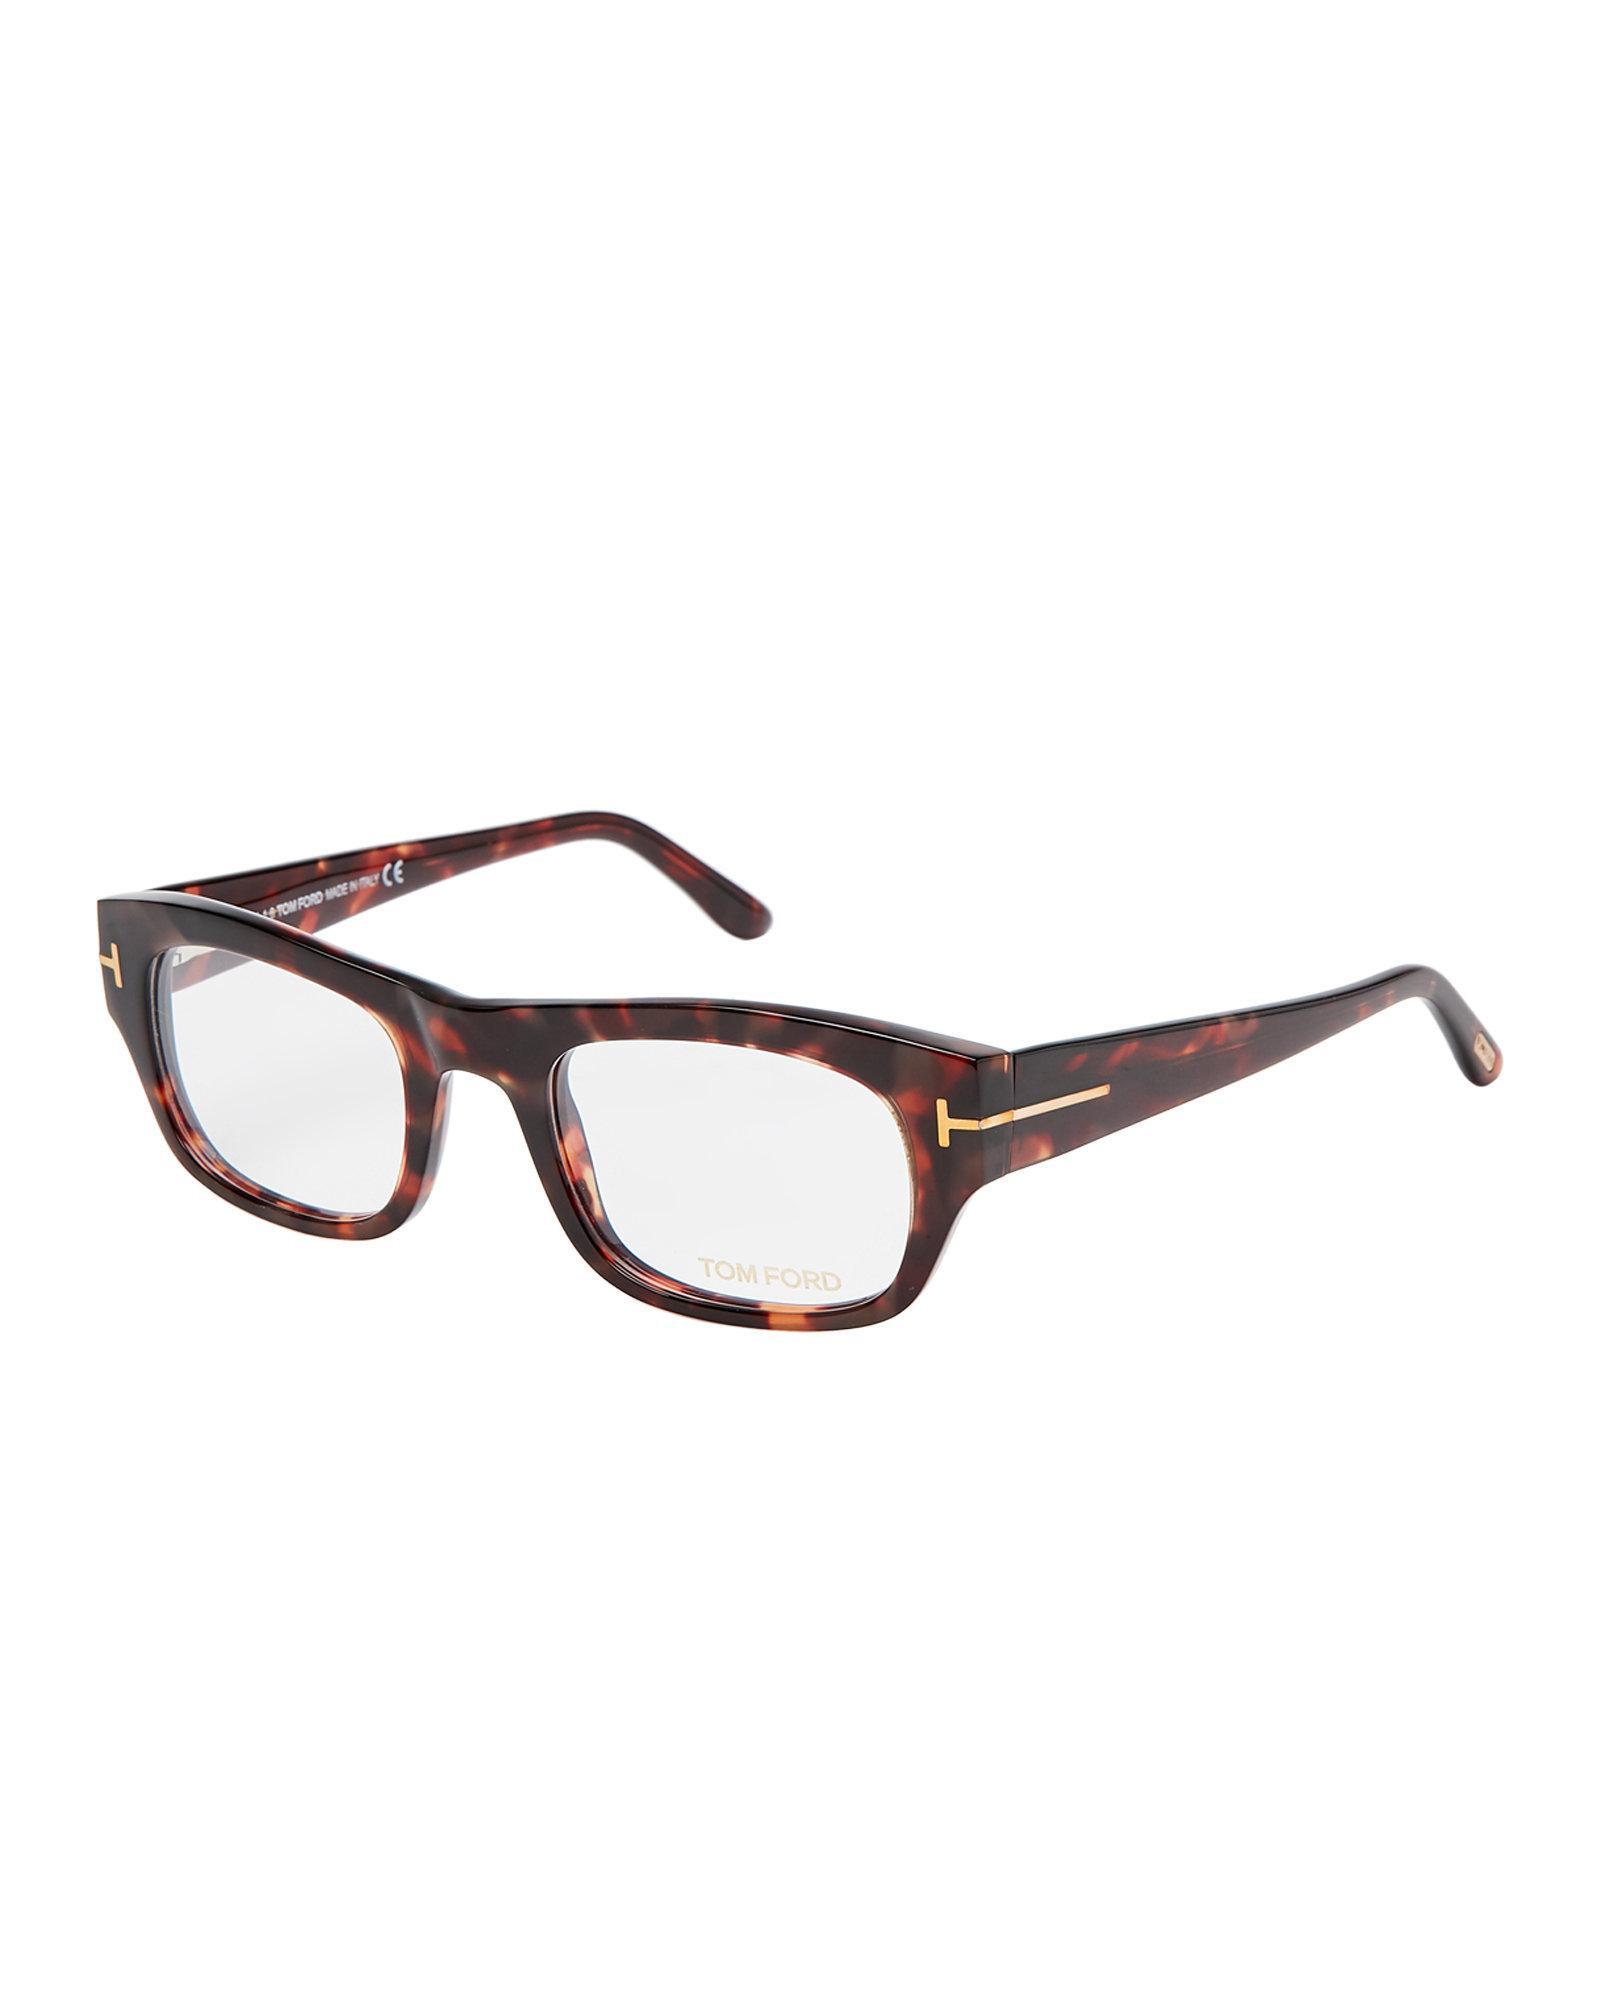 ea37e09645e Lyst - Tom Ford Ft5415 Red Havana Oval Optical Frames in Brown